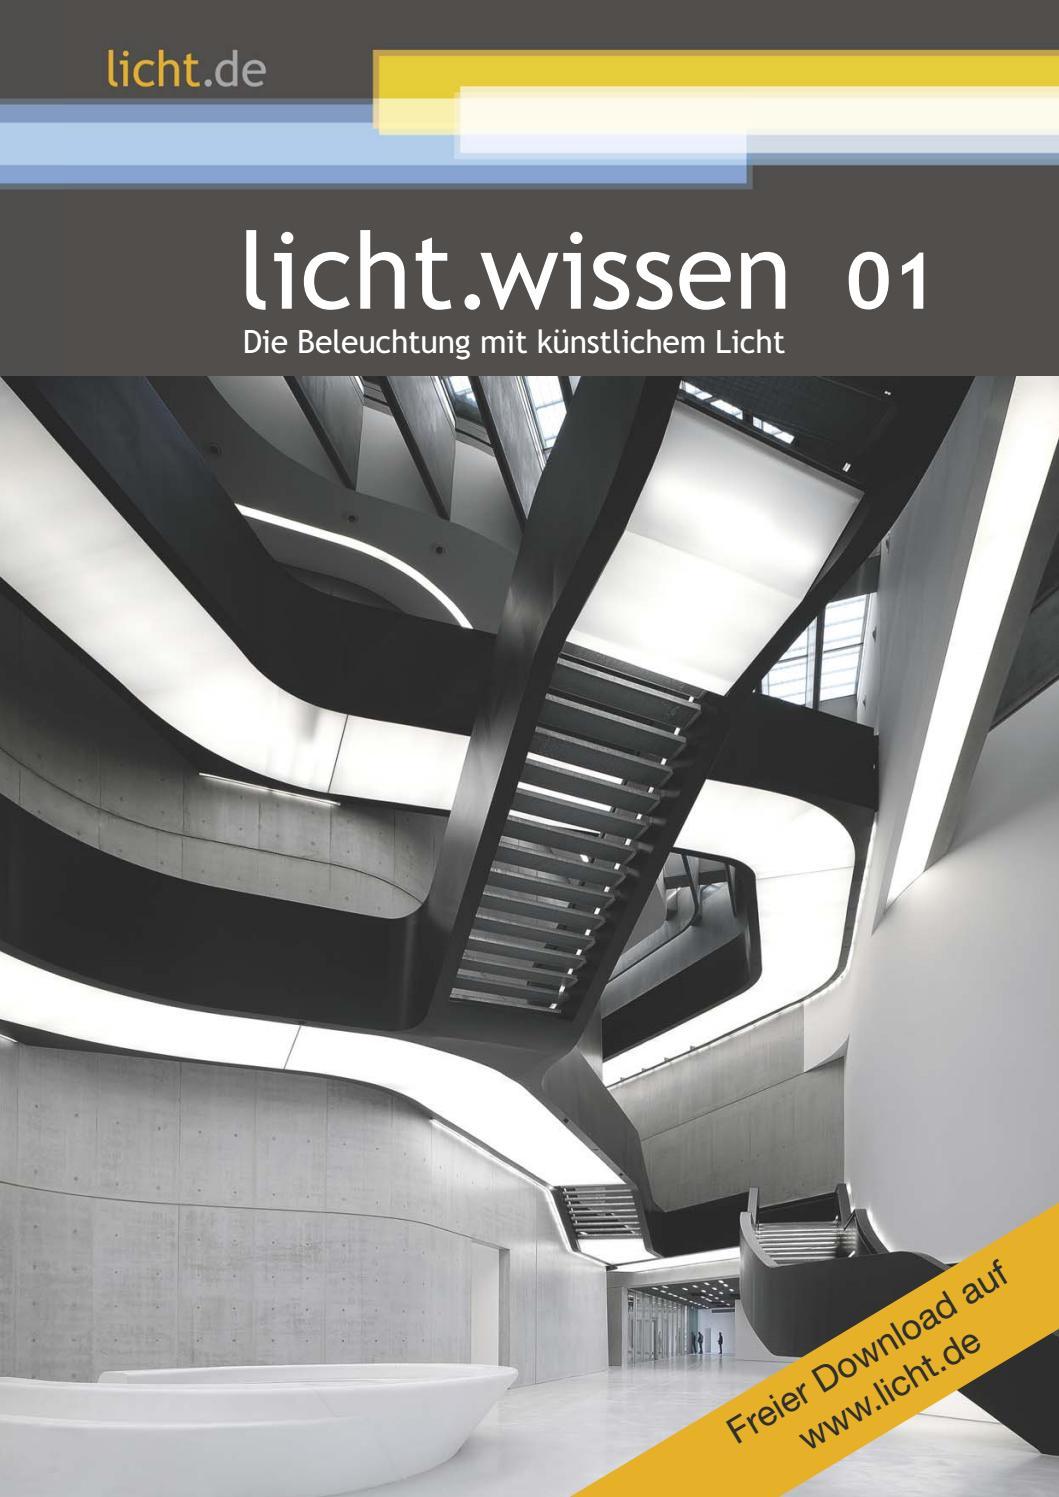 ROTER LEUCHTTURM GARTEN LEUCHTE SOCKEL LAMPE SCHLANK 0,5 METER AUSSENLICHT NEU